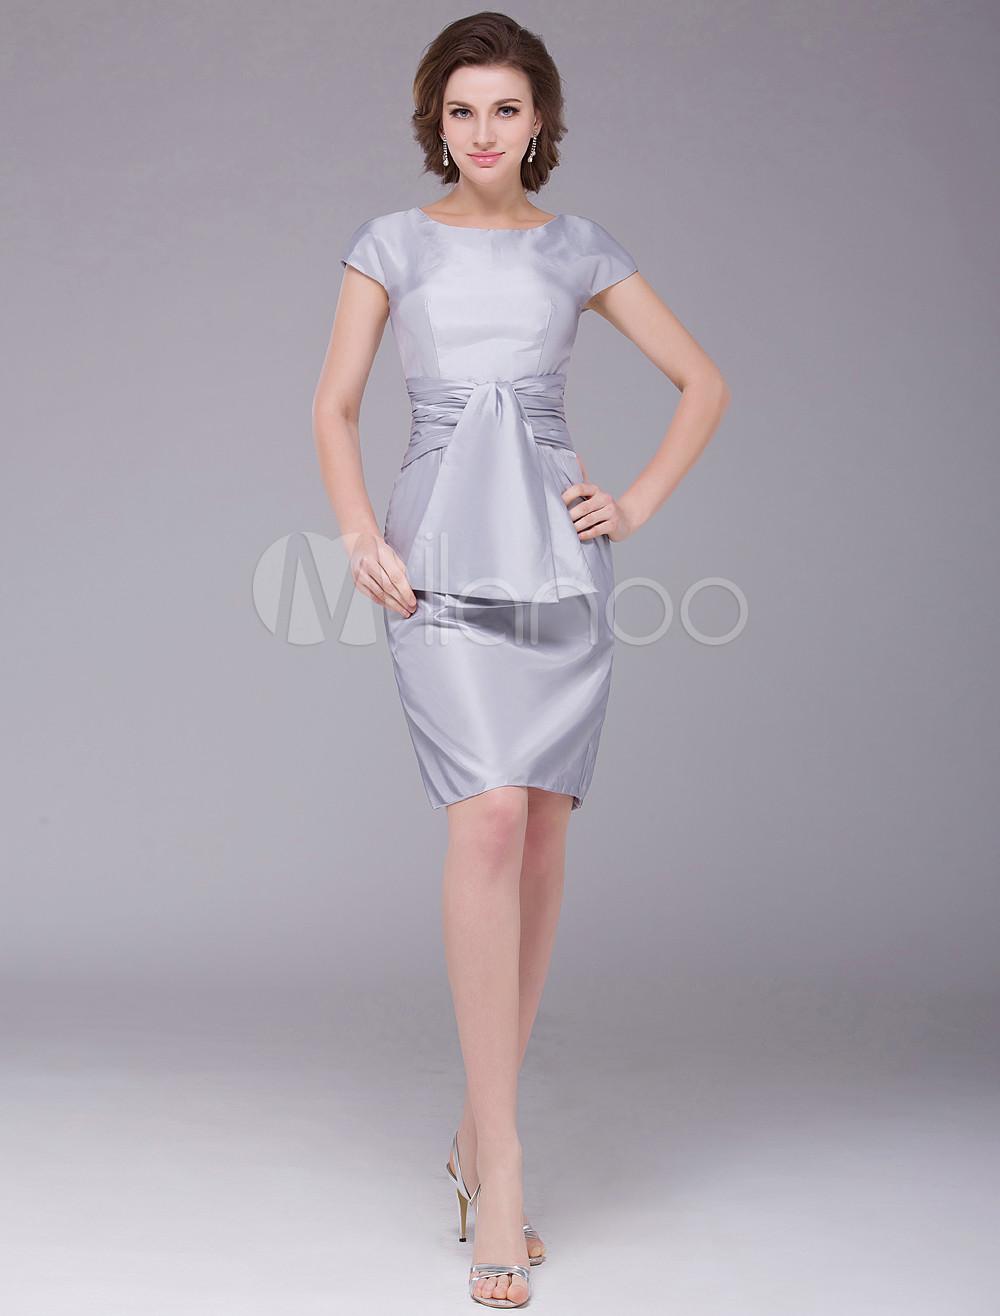 5f77a4157b18 ... Sheath Pleated Zipper Taffeta Bridal Mother Dress Wedding Guest Dress-No.8.  12. 32%OFF. Color Silver